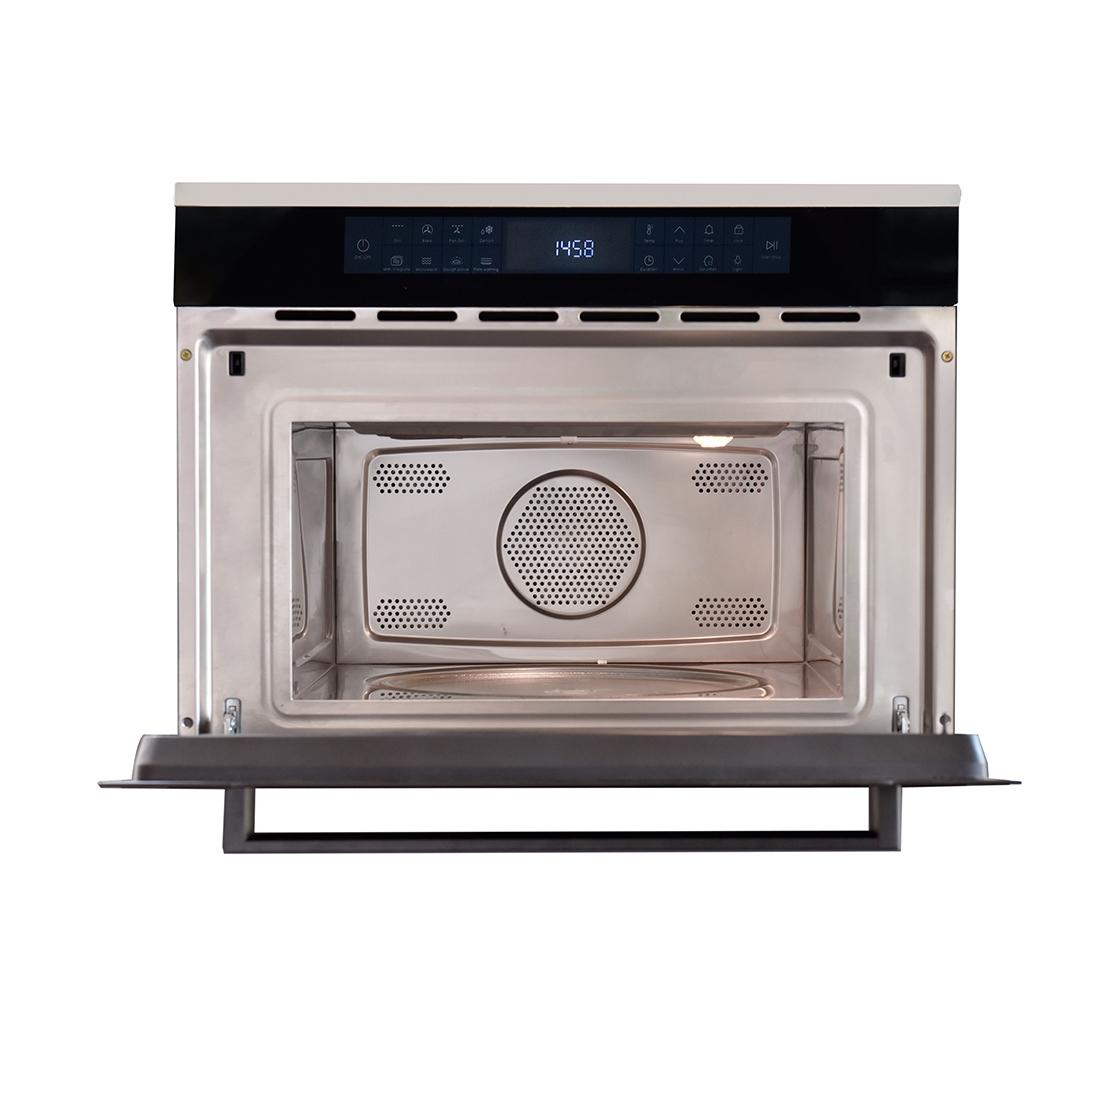 Forno Micro-ondas Cuisinart Arkton com Grill Elétrico Inox 60cm 38 Litros 220V